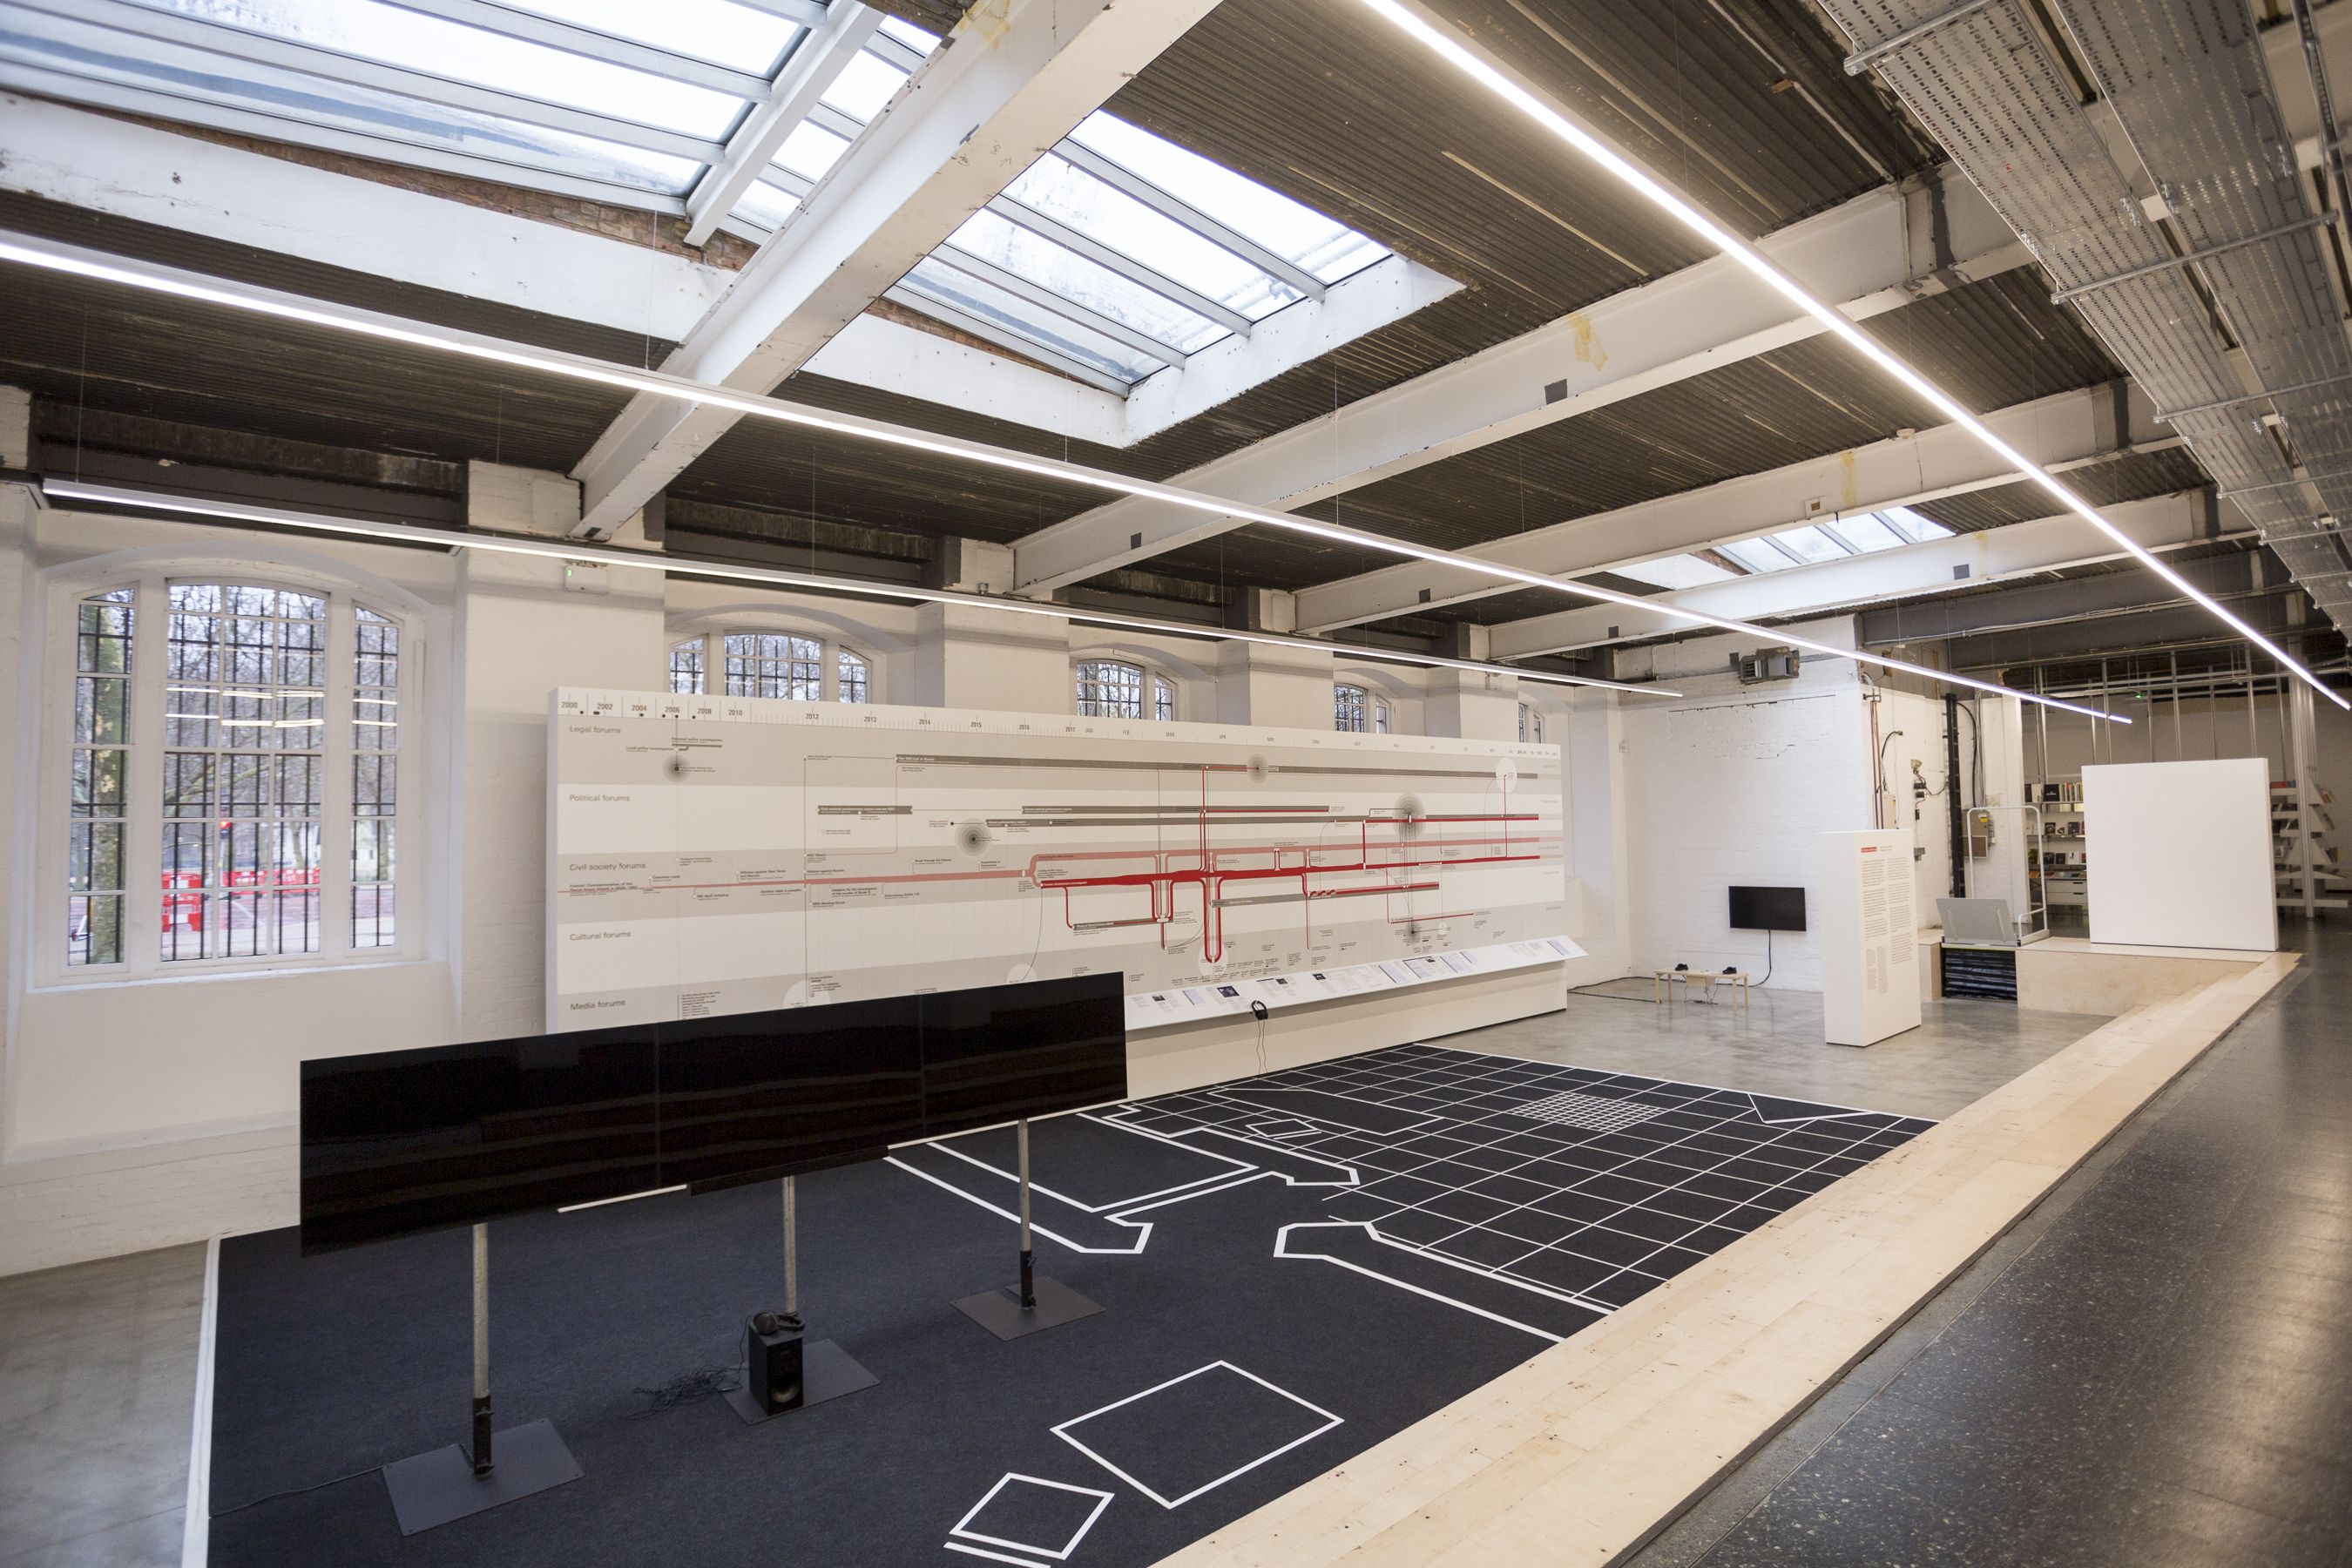 Neue Museumsbeleuchtung Mit Der Sl 20 3 Led Silver Lichtinstallation Beleuchtung Led